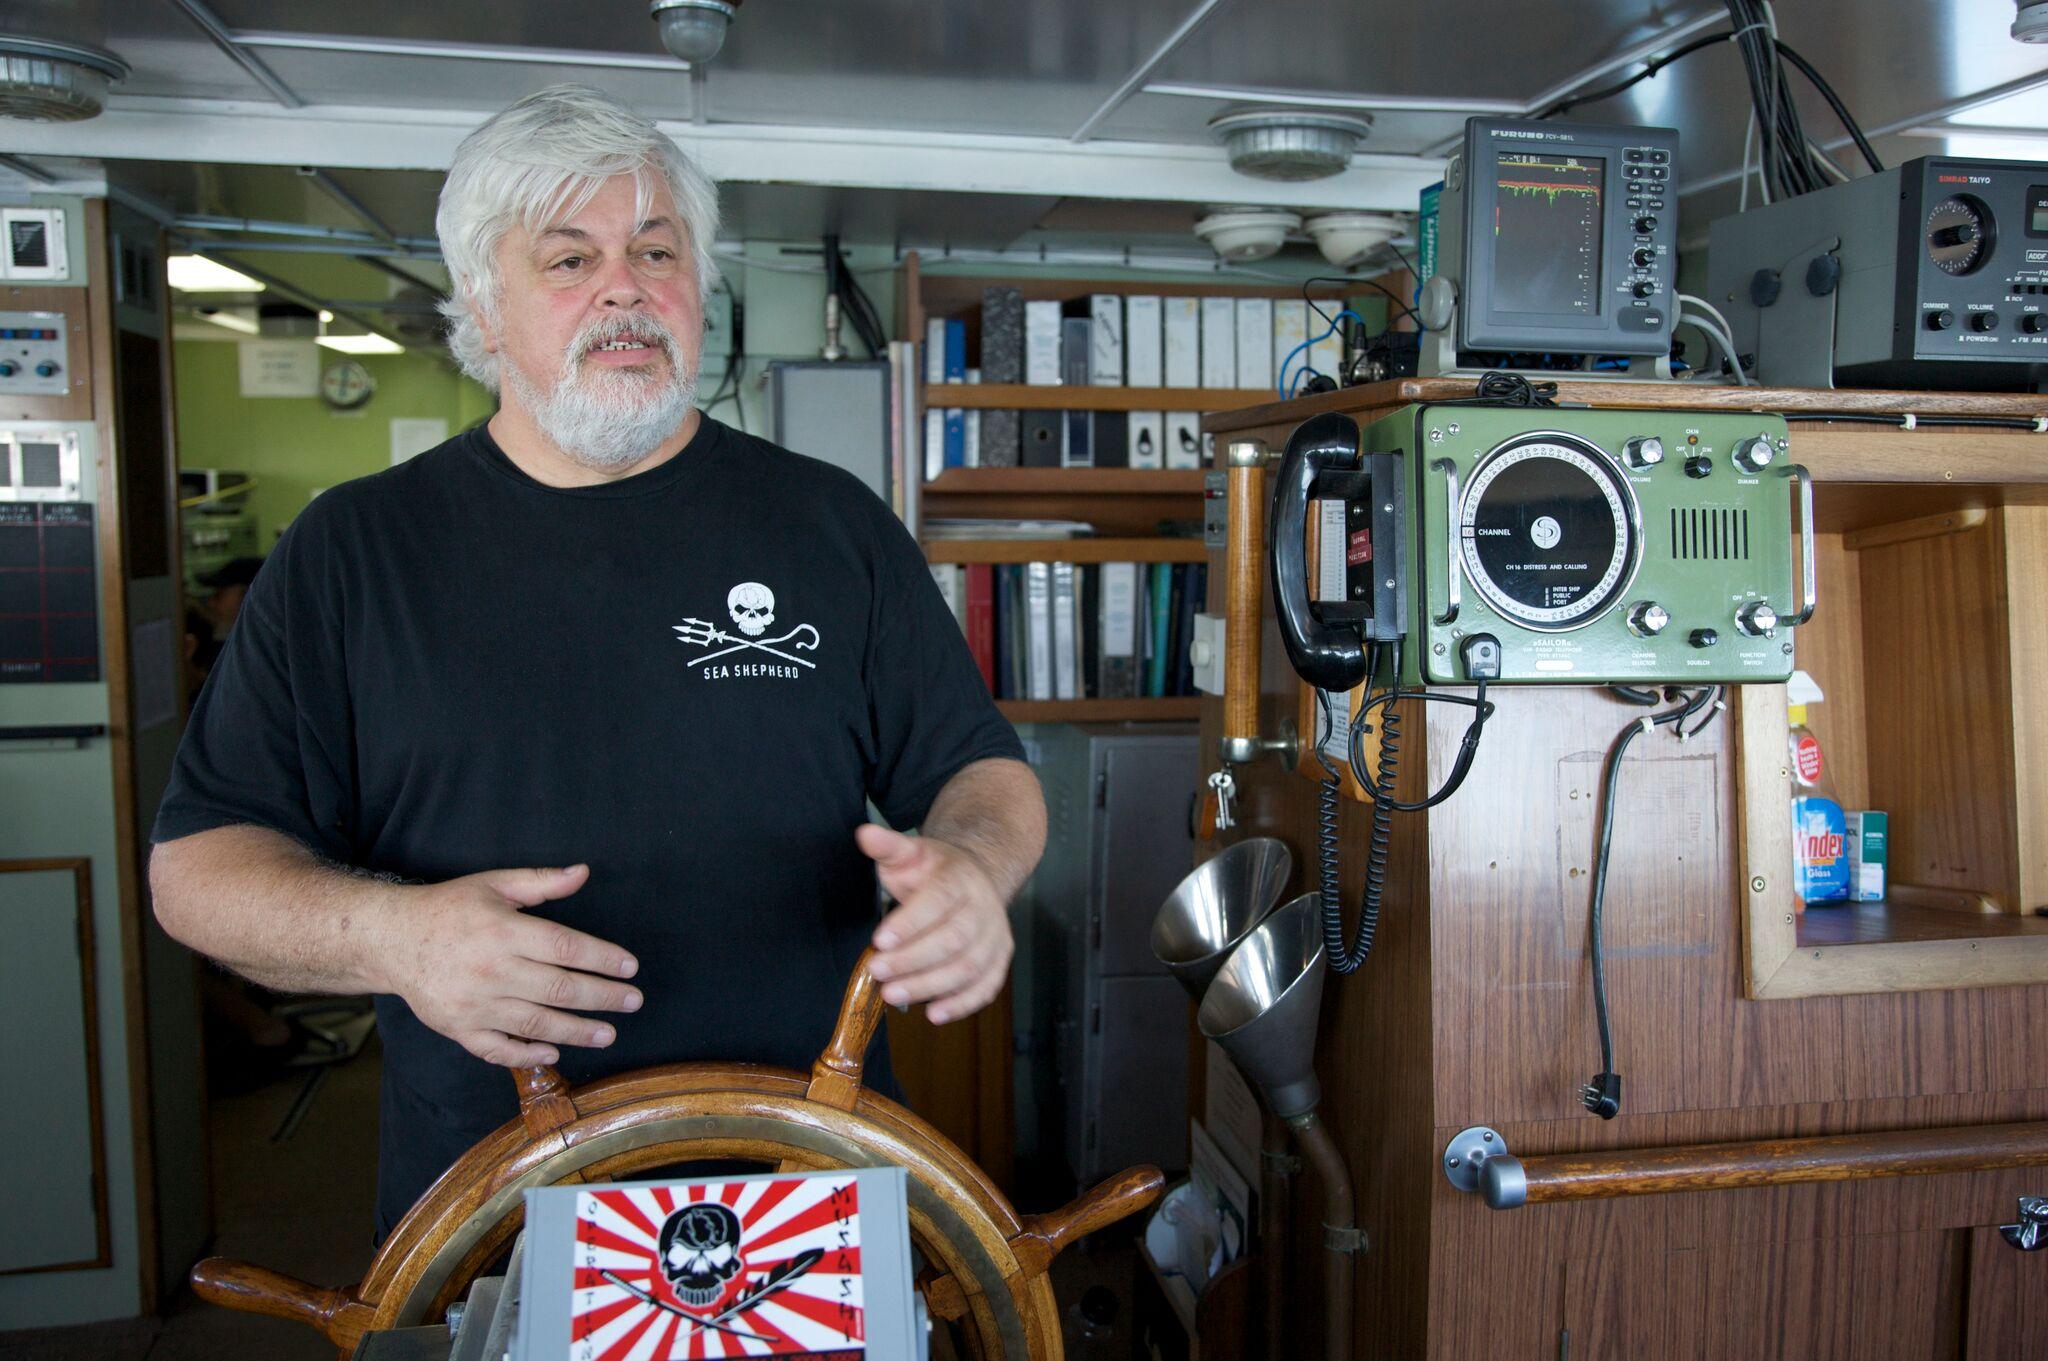 Captain Paul Watson of Whale Wars and Sea Shepherd in San Diego Saturday